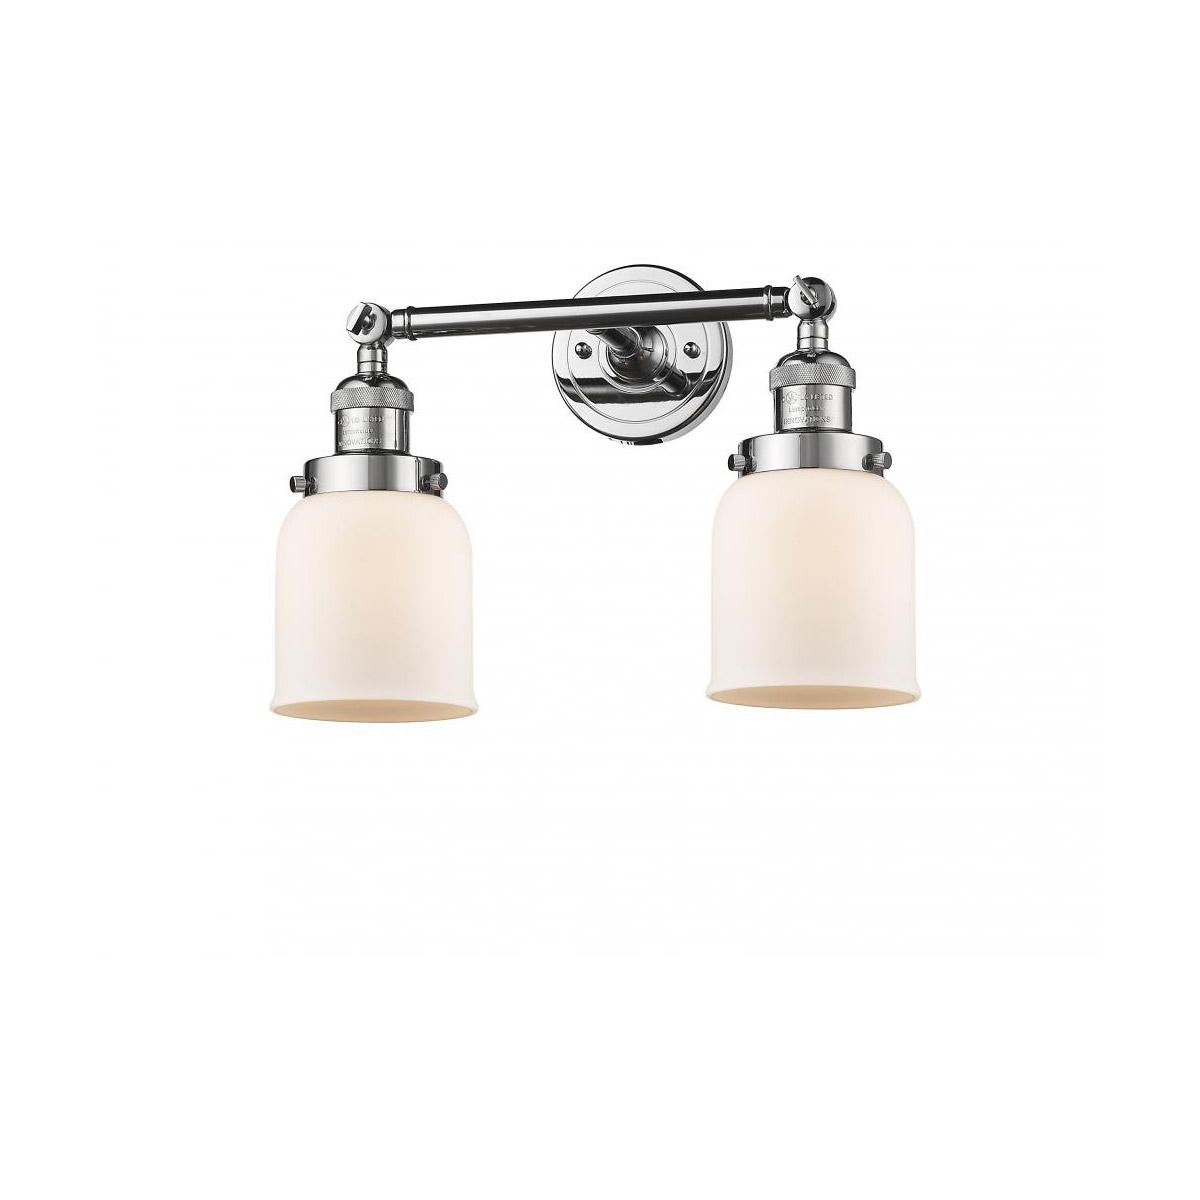 Avalon Polished Chrome Bathroom Vanity Ceiling Lights: Innovations Lighting 208-PC-G51 Small Bell Bathroom Vanity